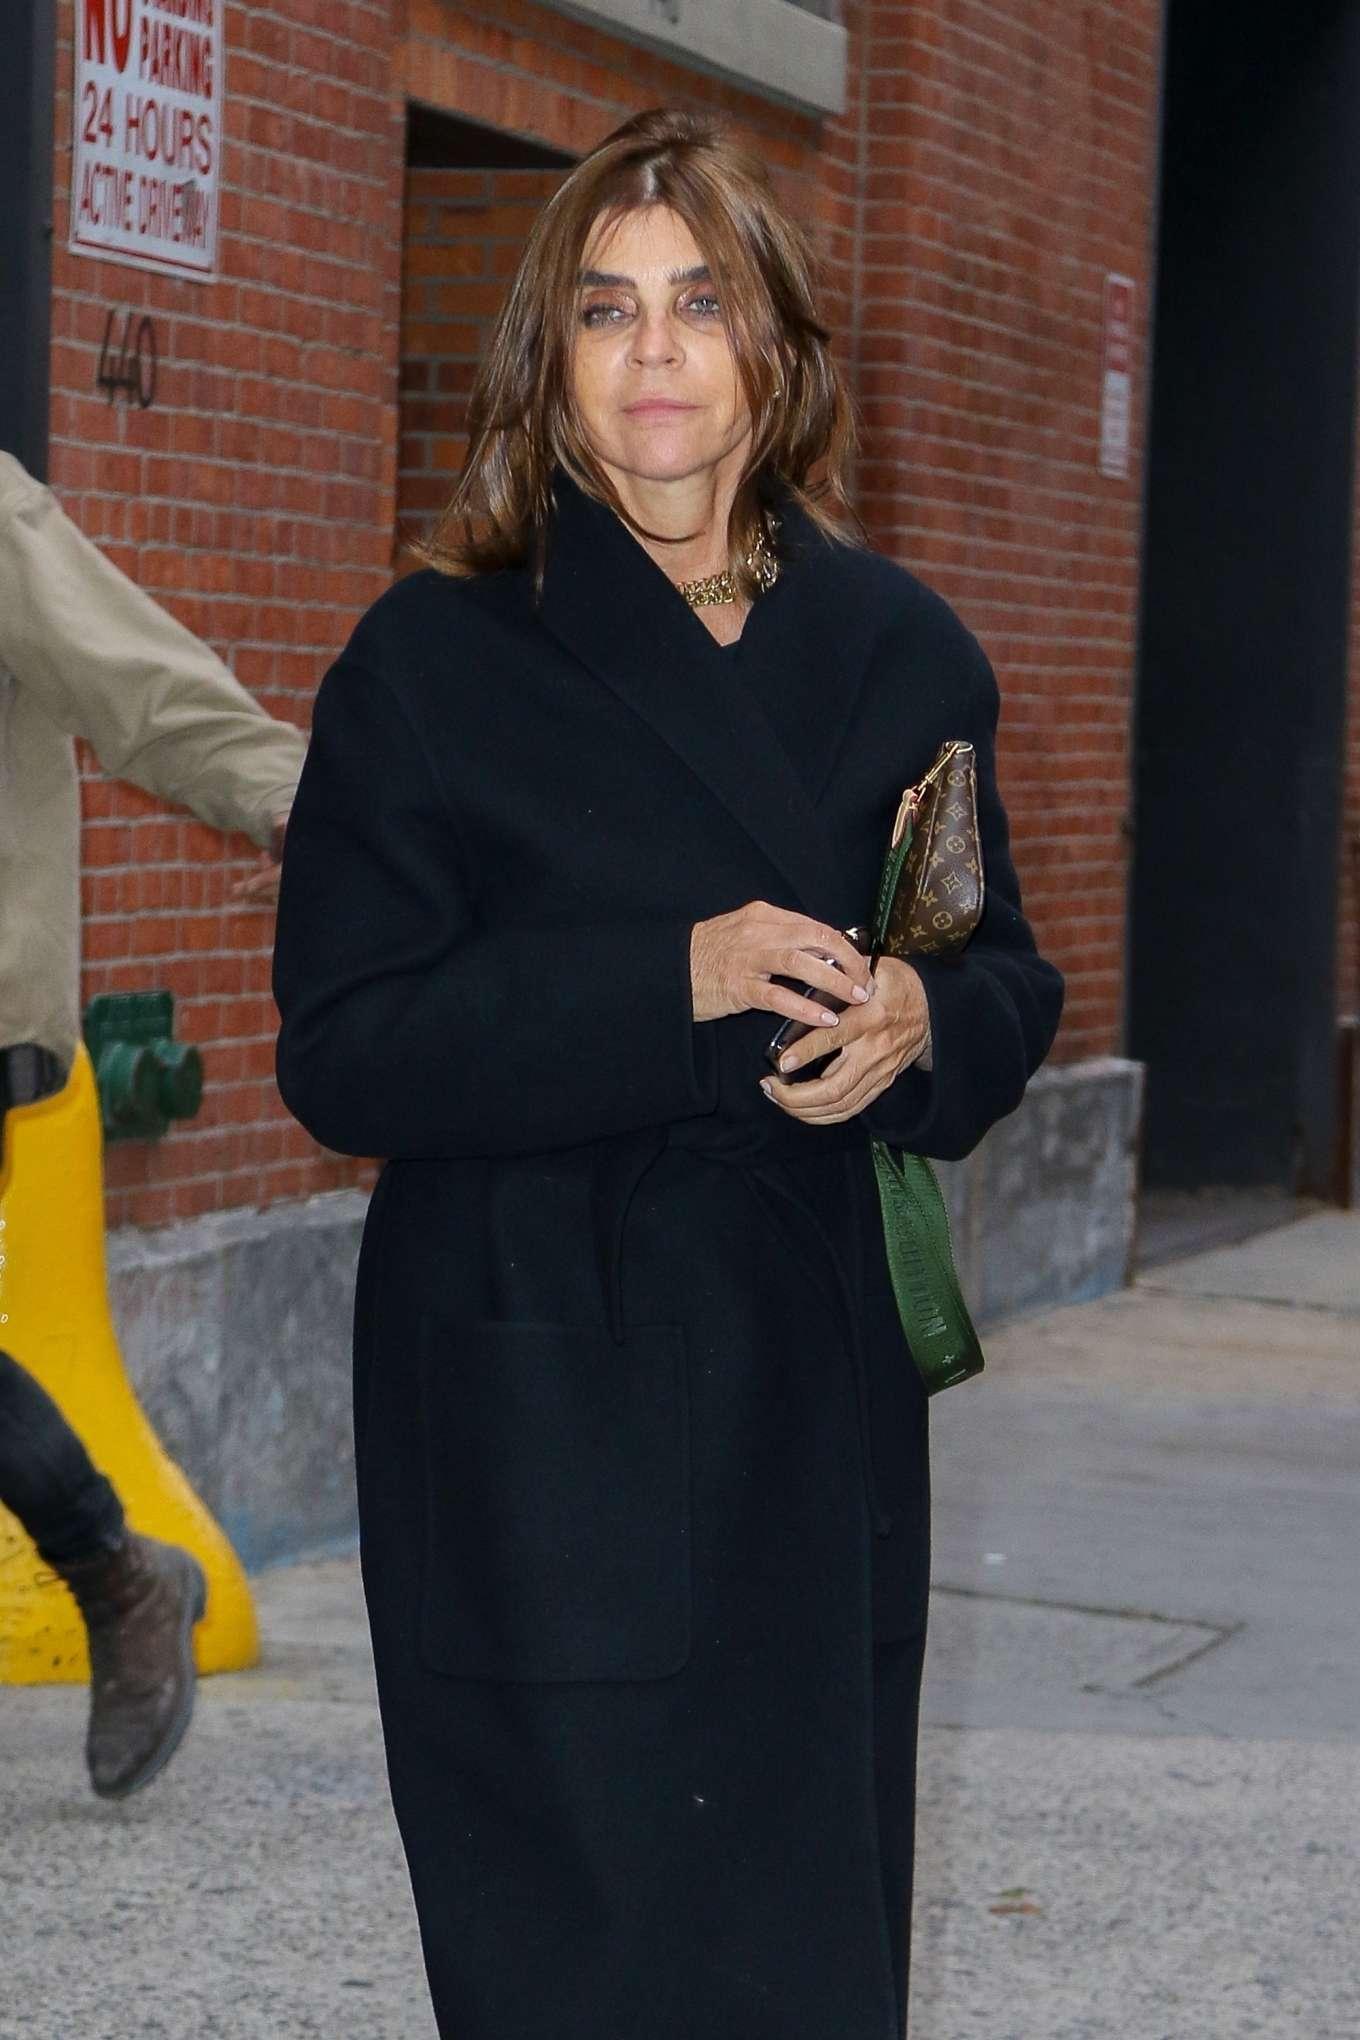 Carine Roitfeld - Leaving a photo studio in NYC